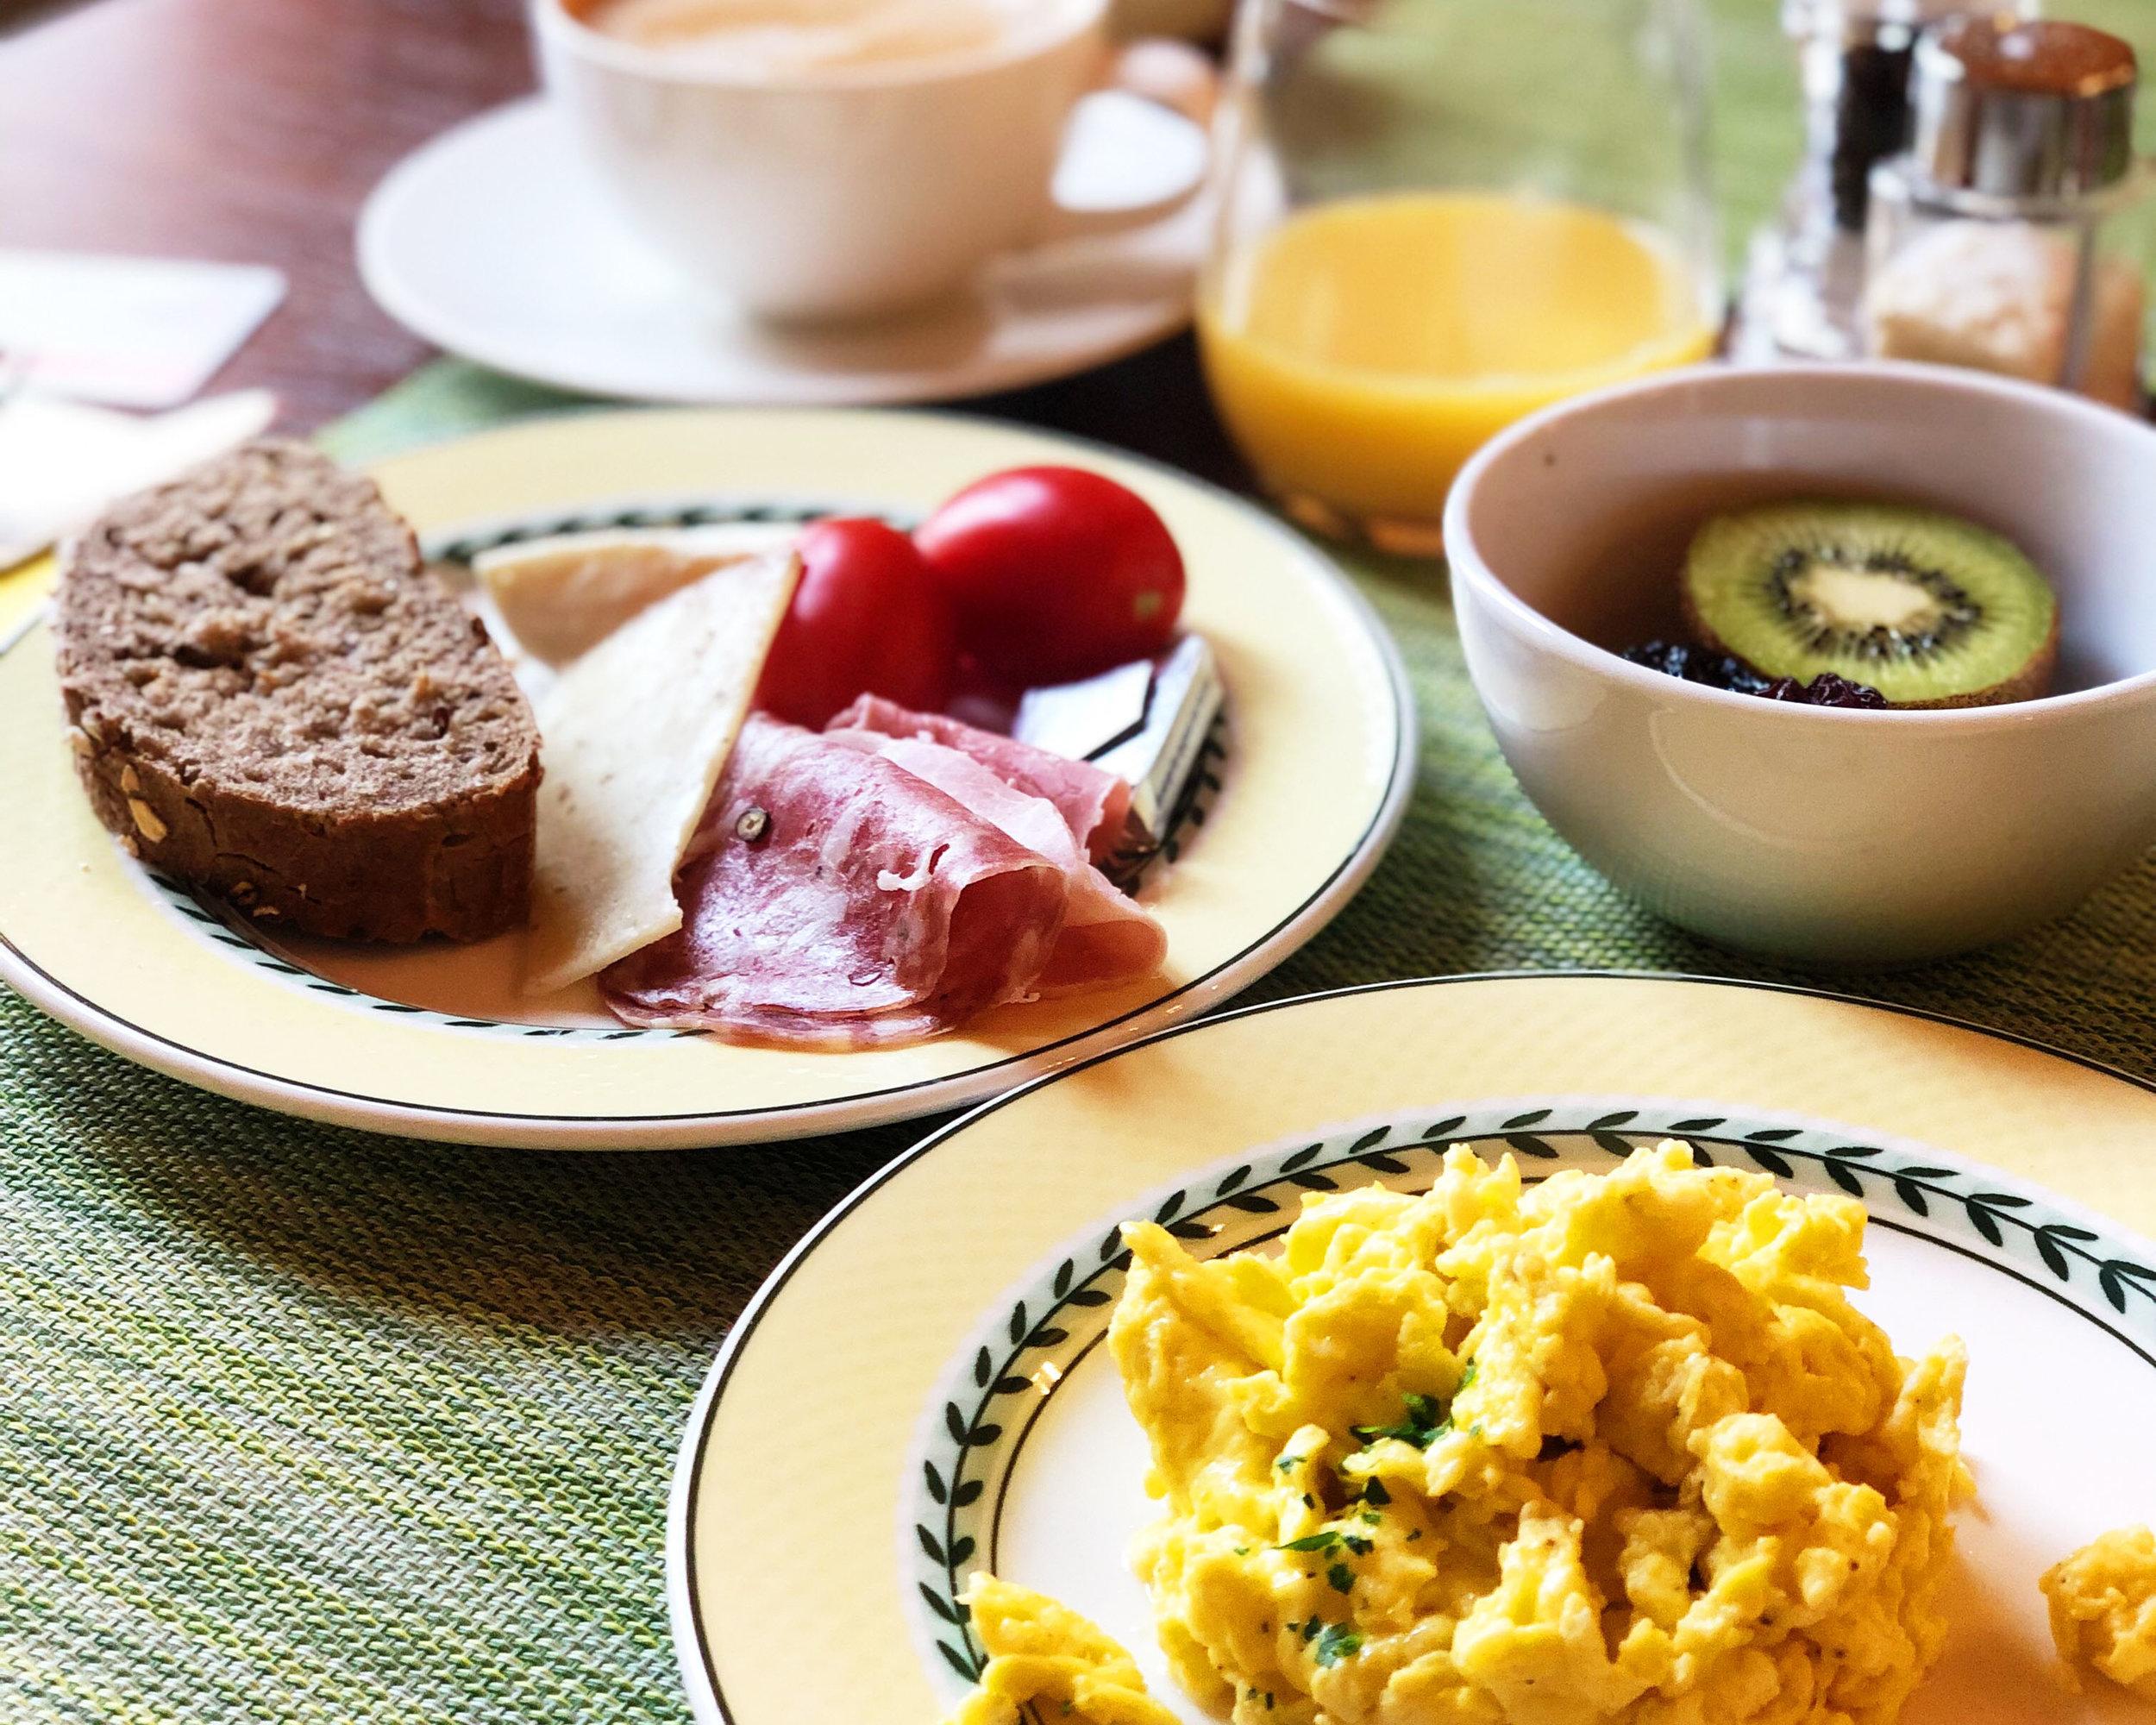 breakfastitaly.jpg